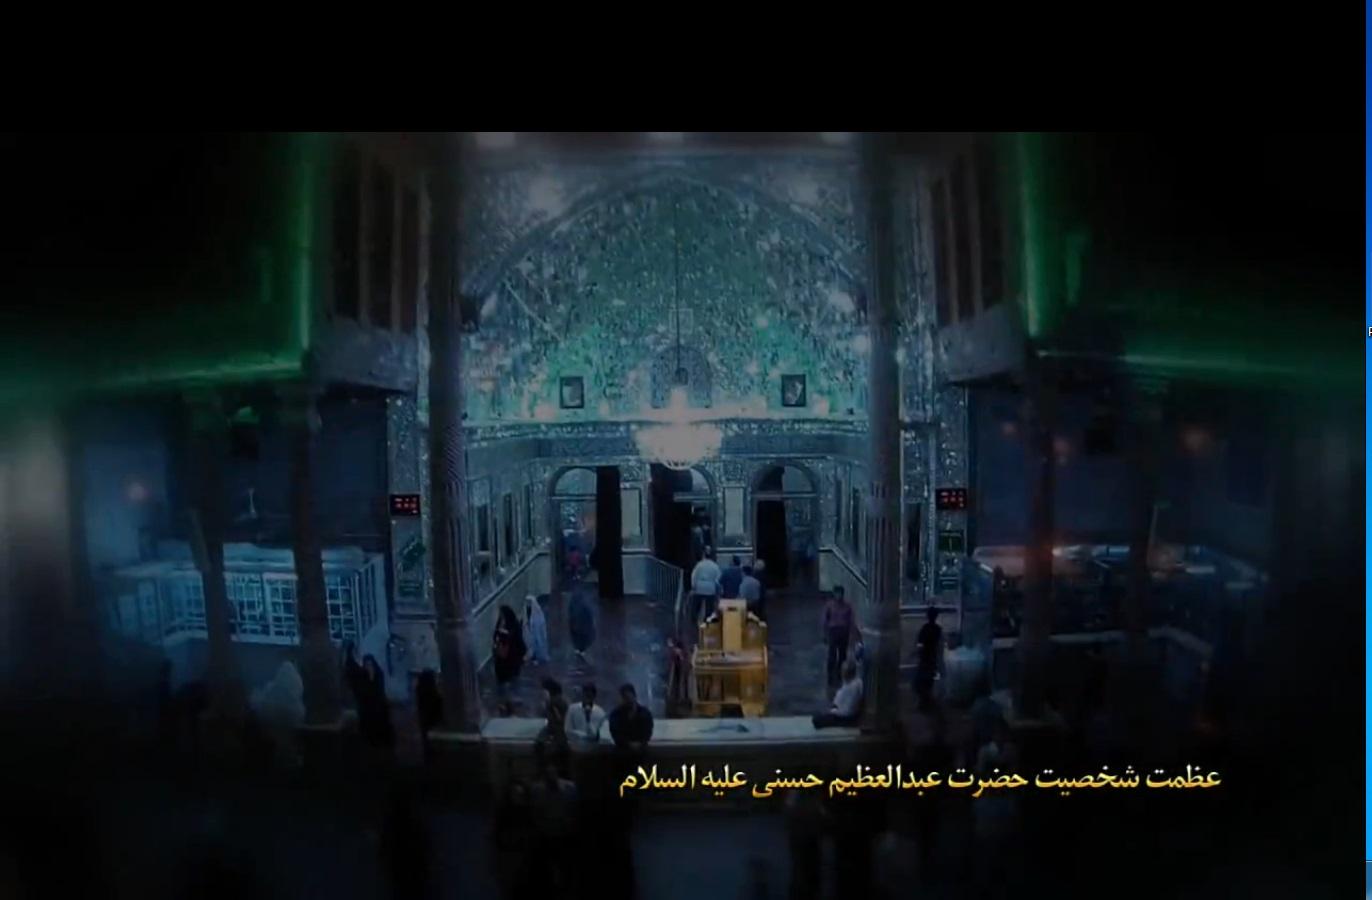 دکلمه حضرت عبد العظیم الحسنی